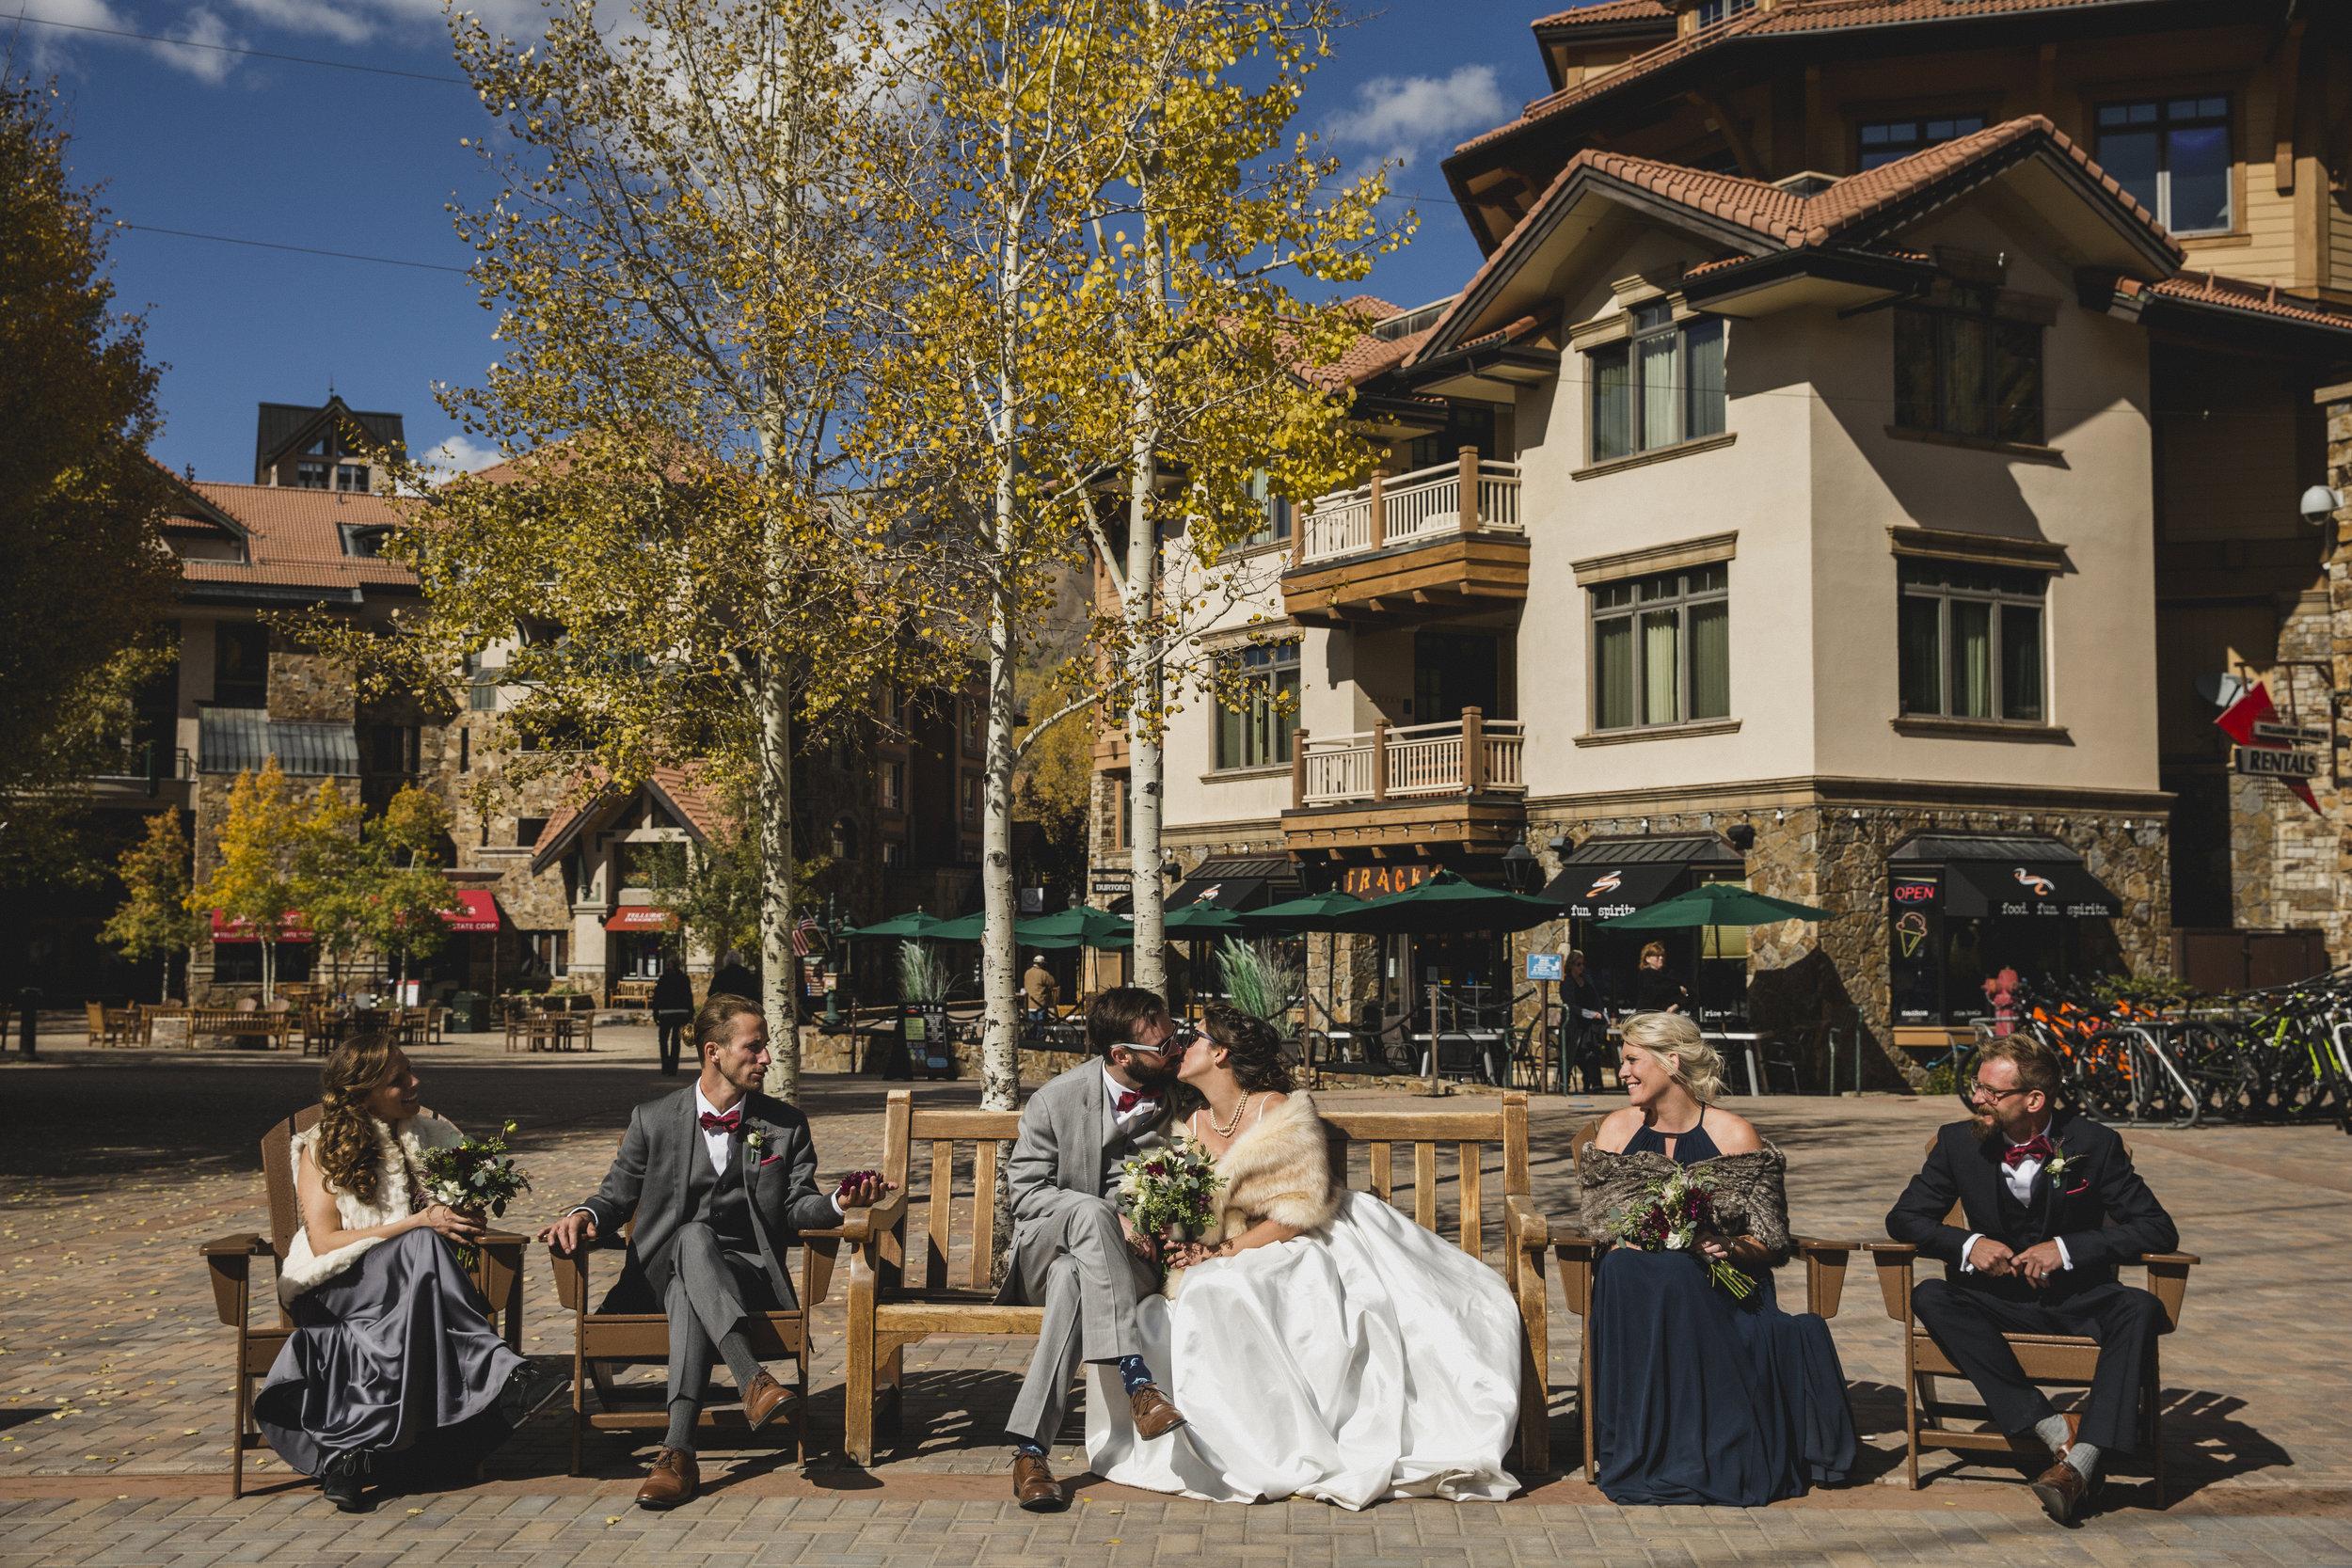 NE-LeahandAshtonphotography-Telluride-Wedding-Photography-9657.jpg